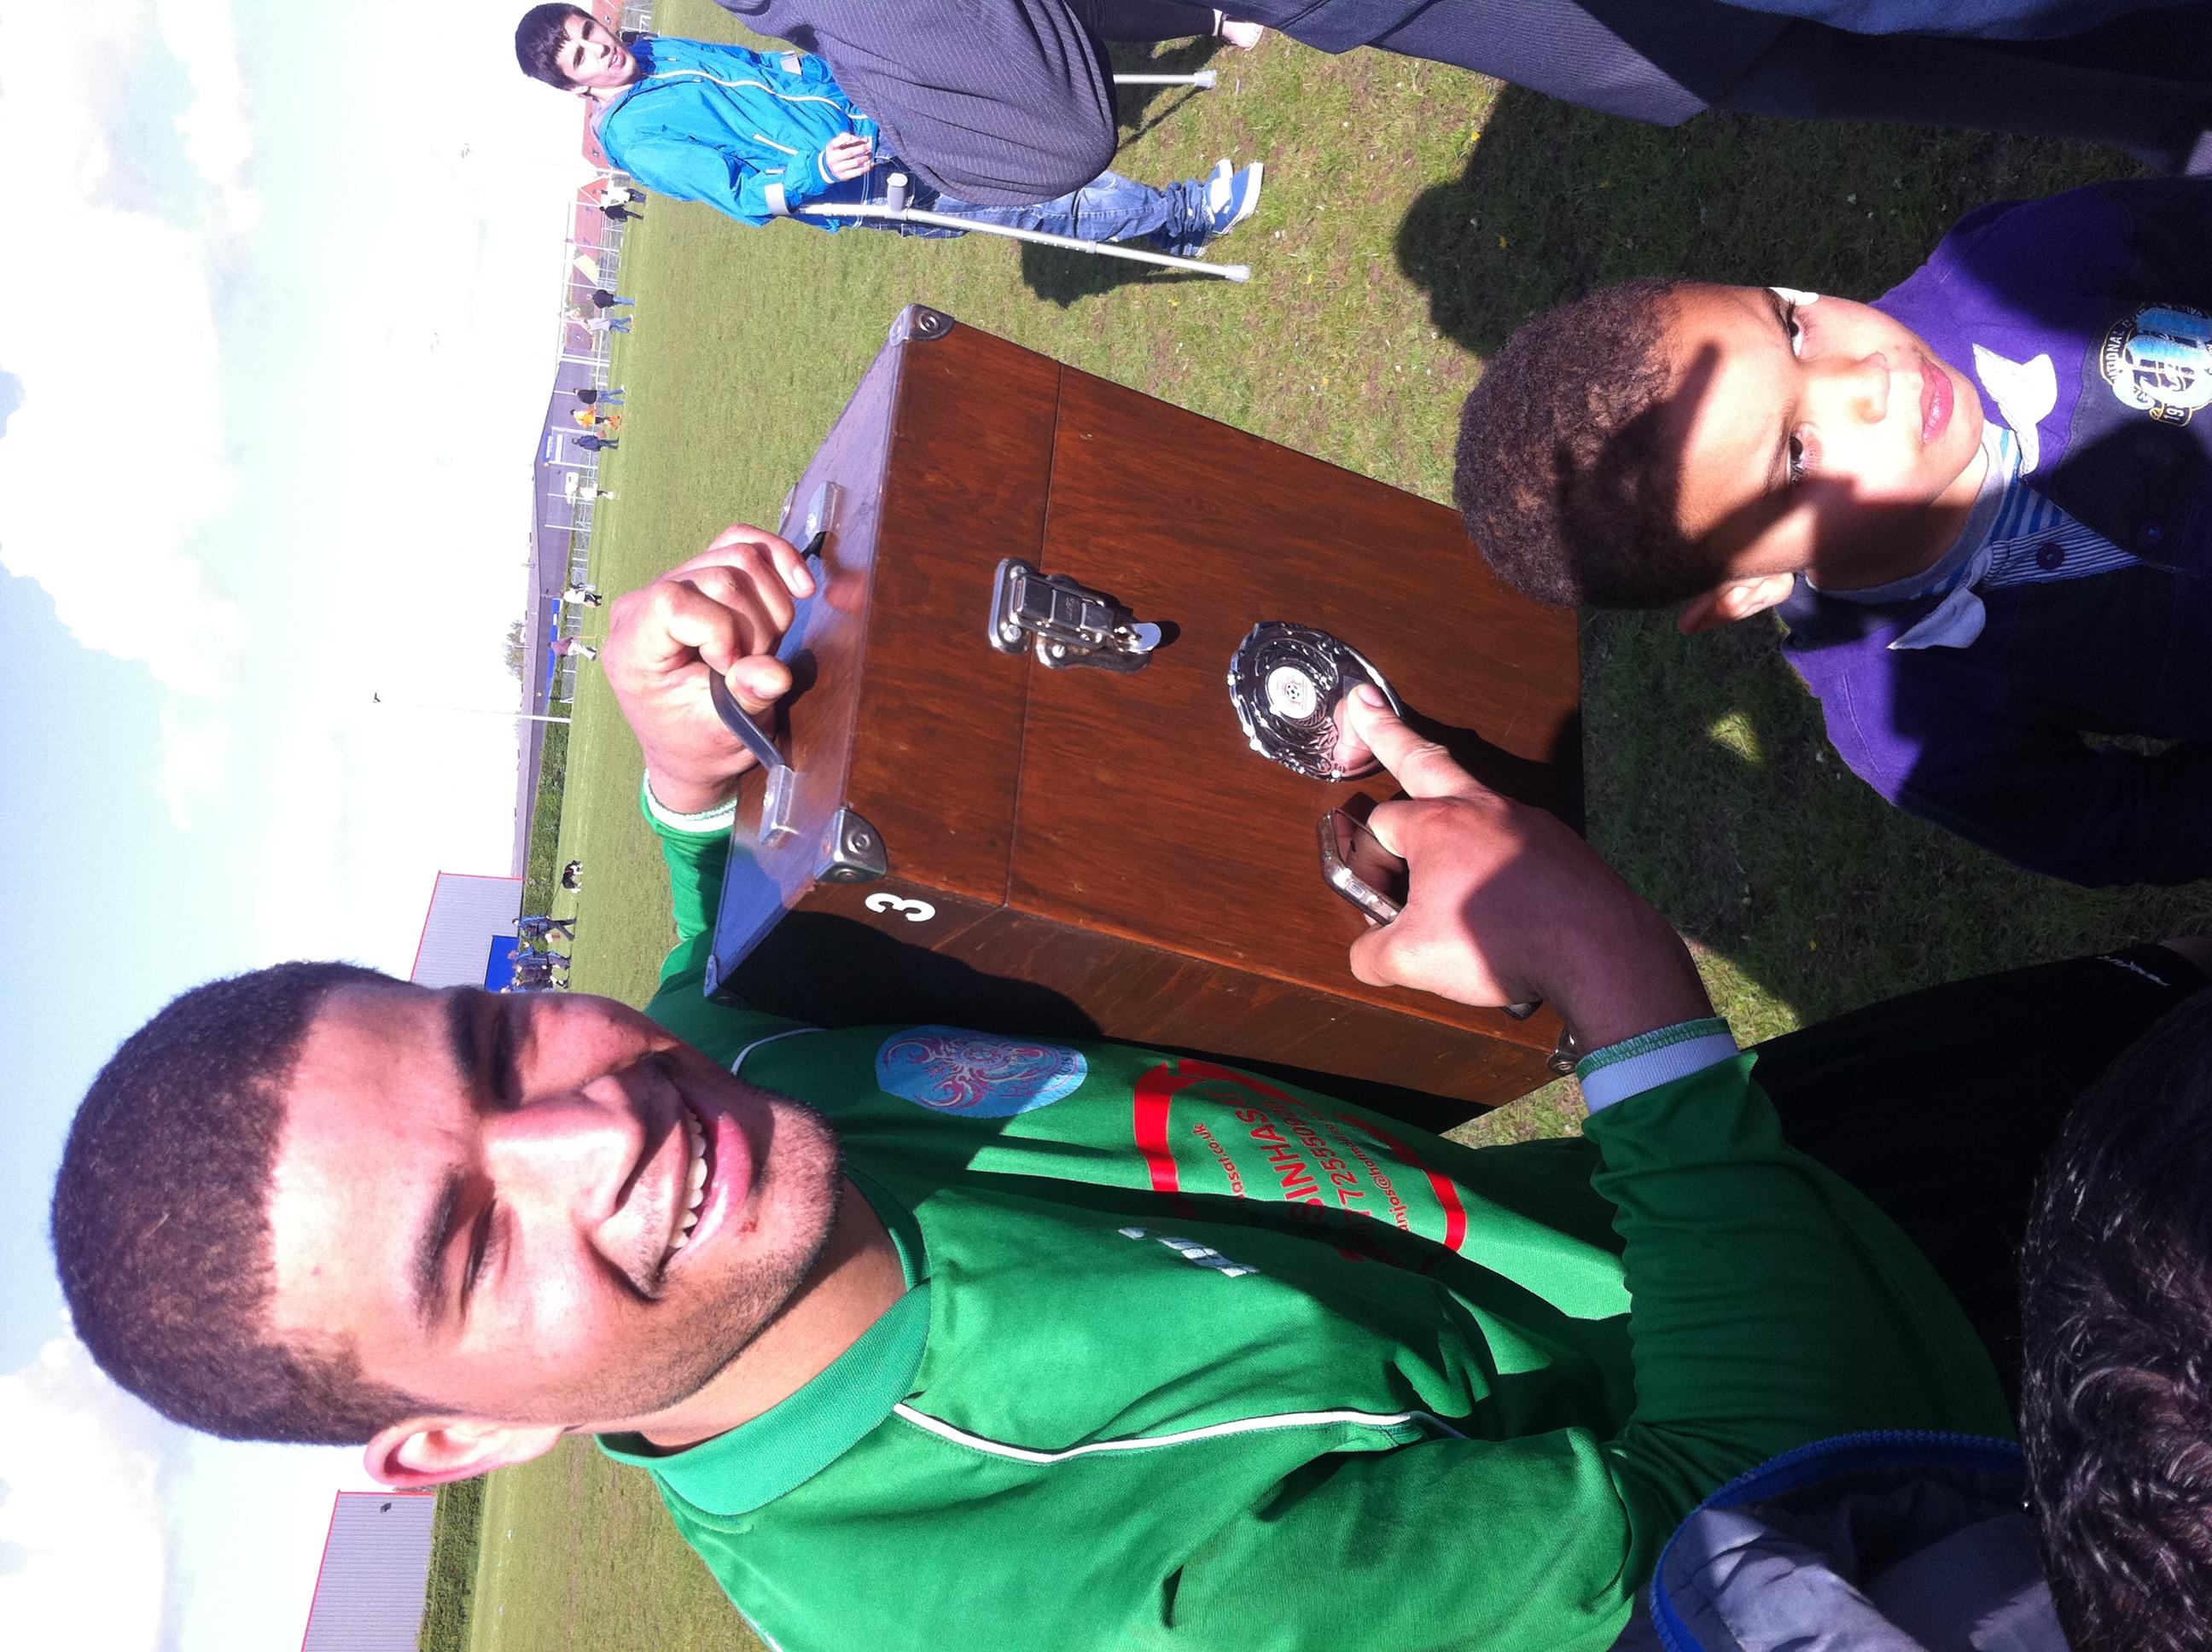 Dino enjoying the trophy